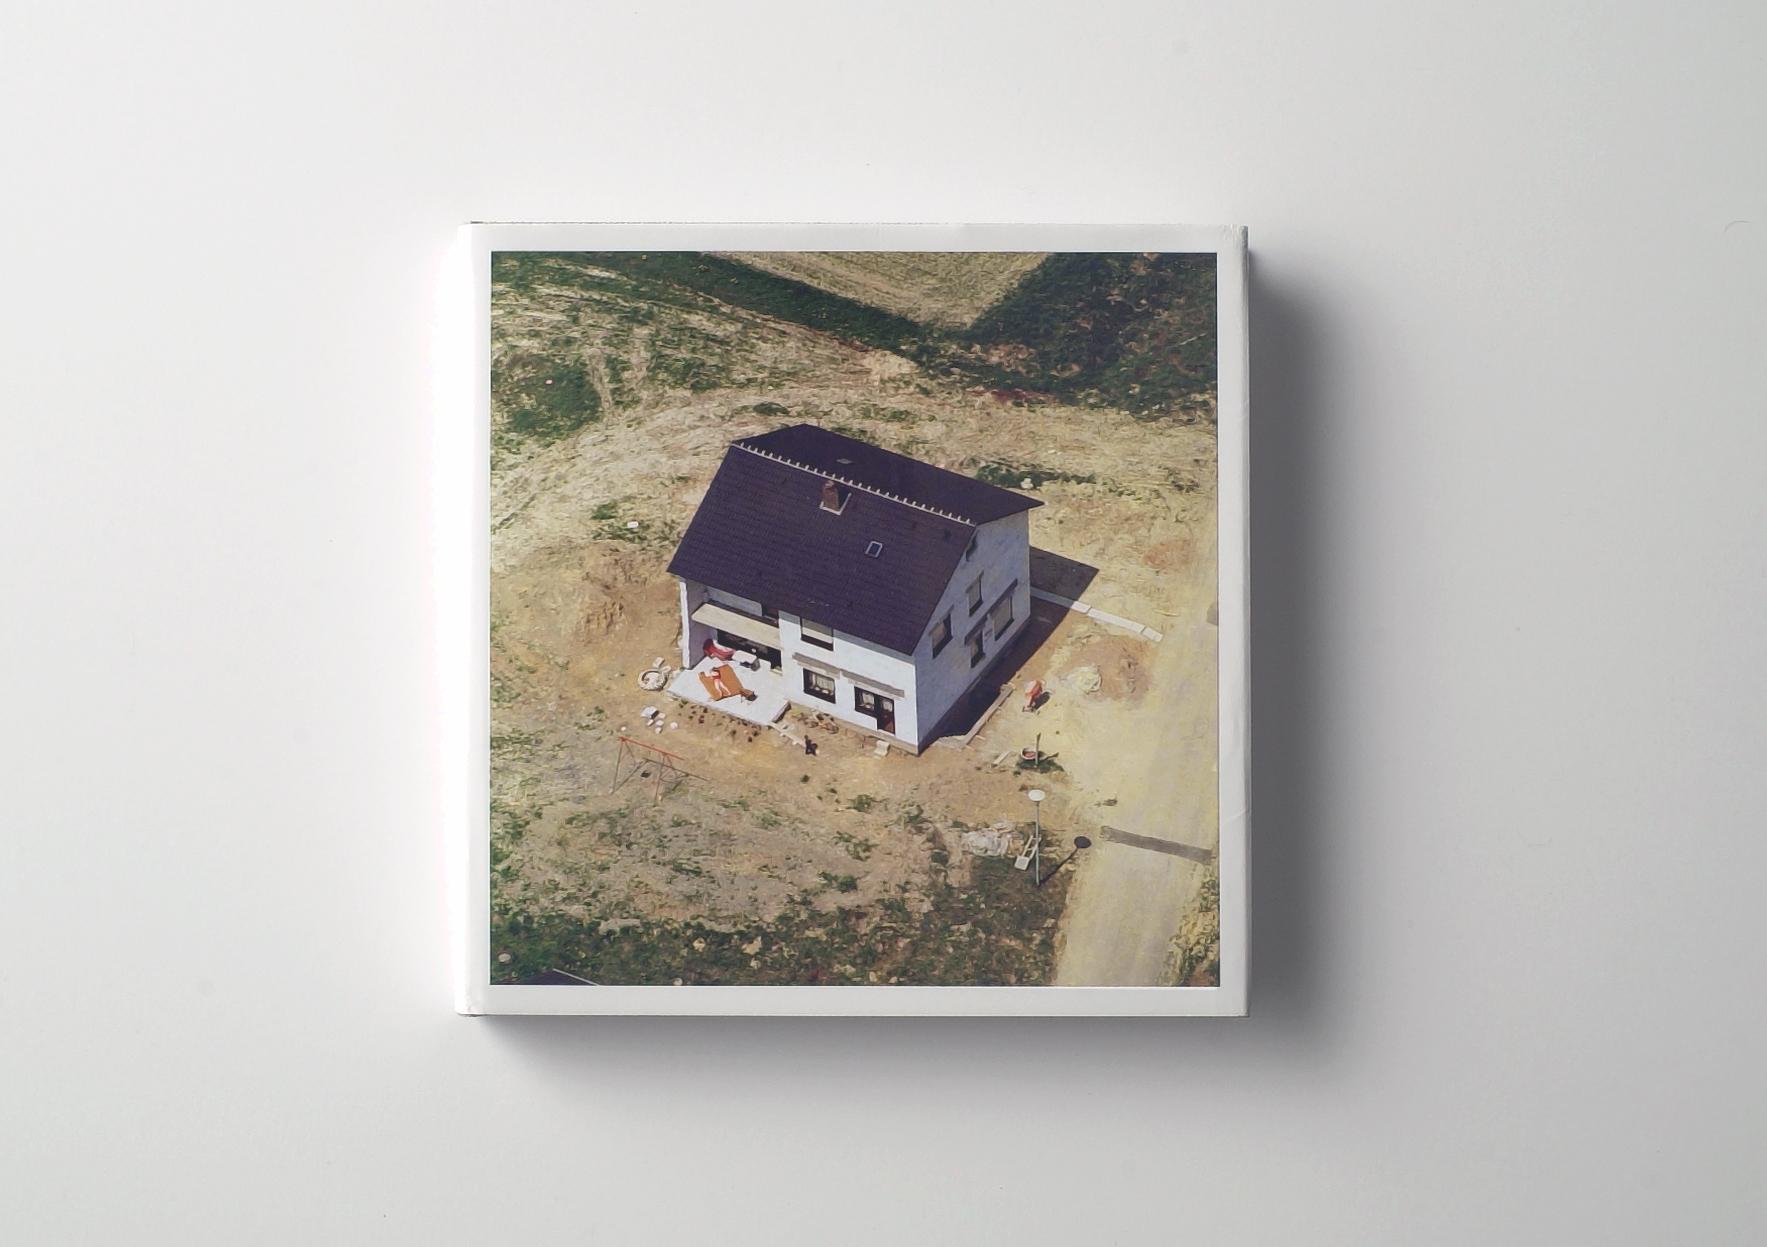 | Archiv Peter Piller: Von Erde schöner | ProjecteSD